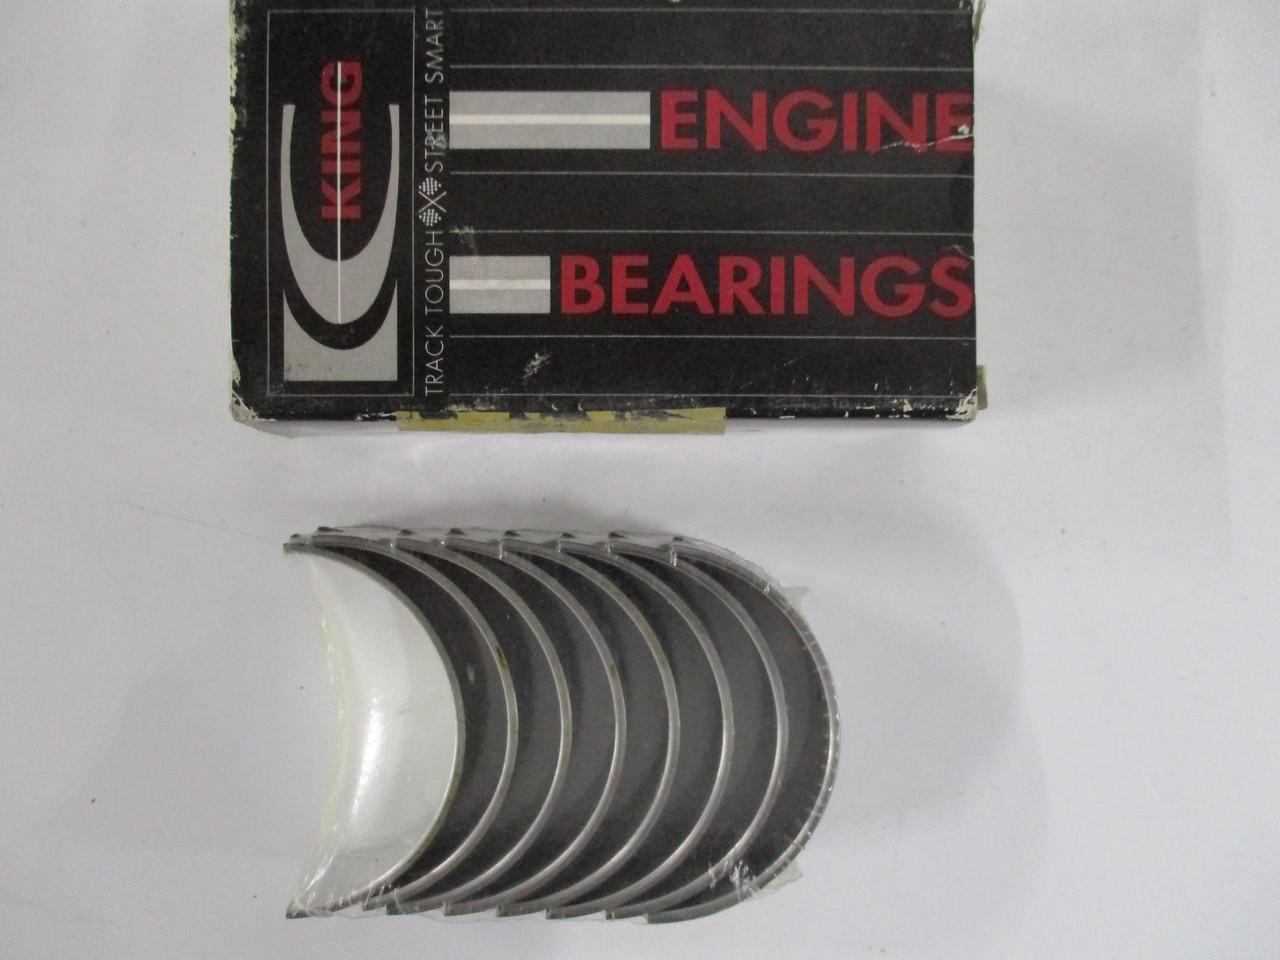 Вкладыши коленвала шатунные +0.25 mm KING CR4134AM FORD 2.0 DOHC